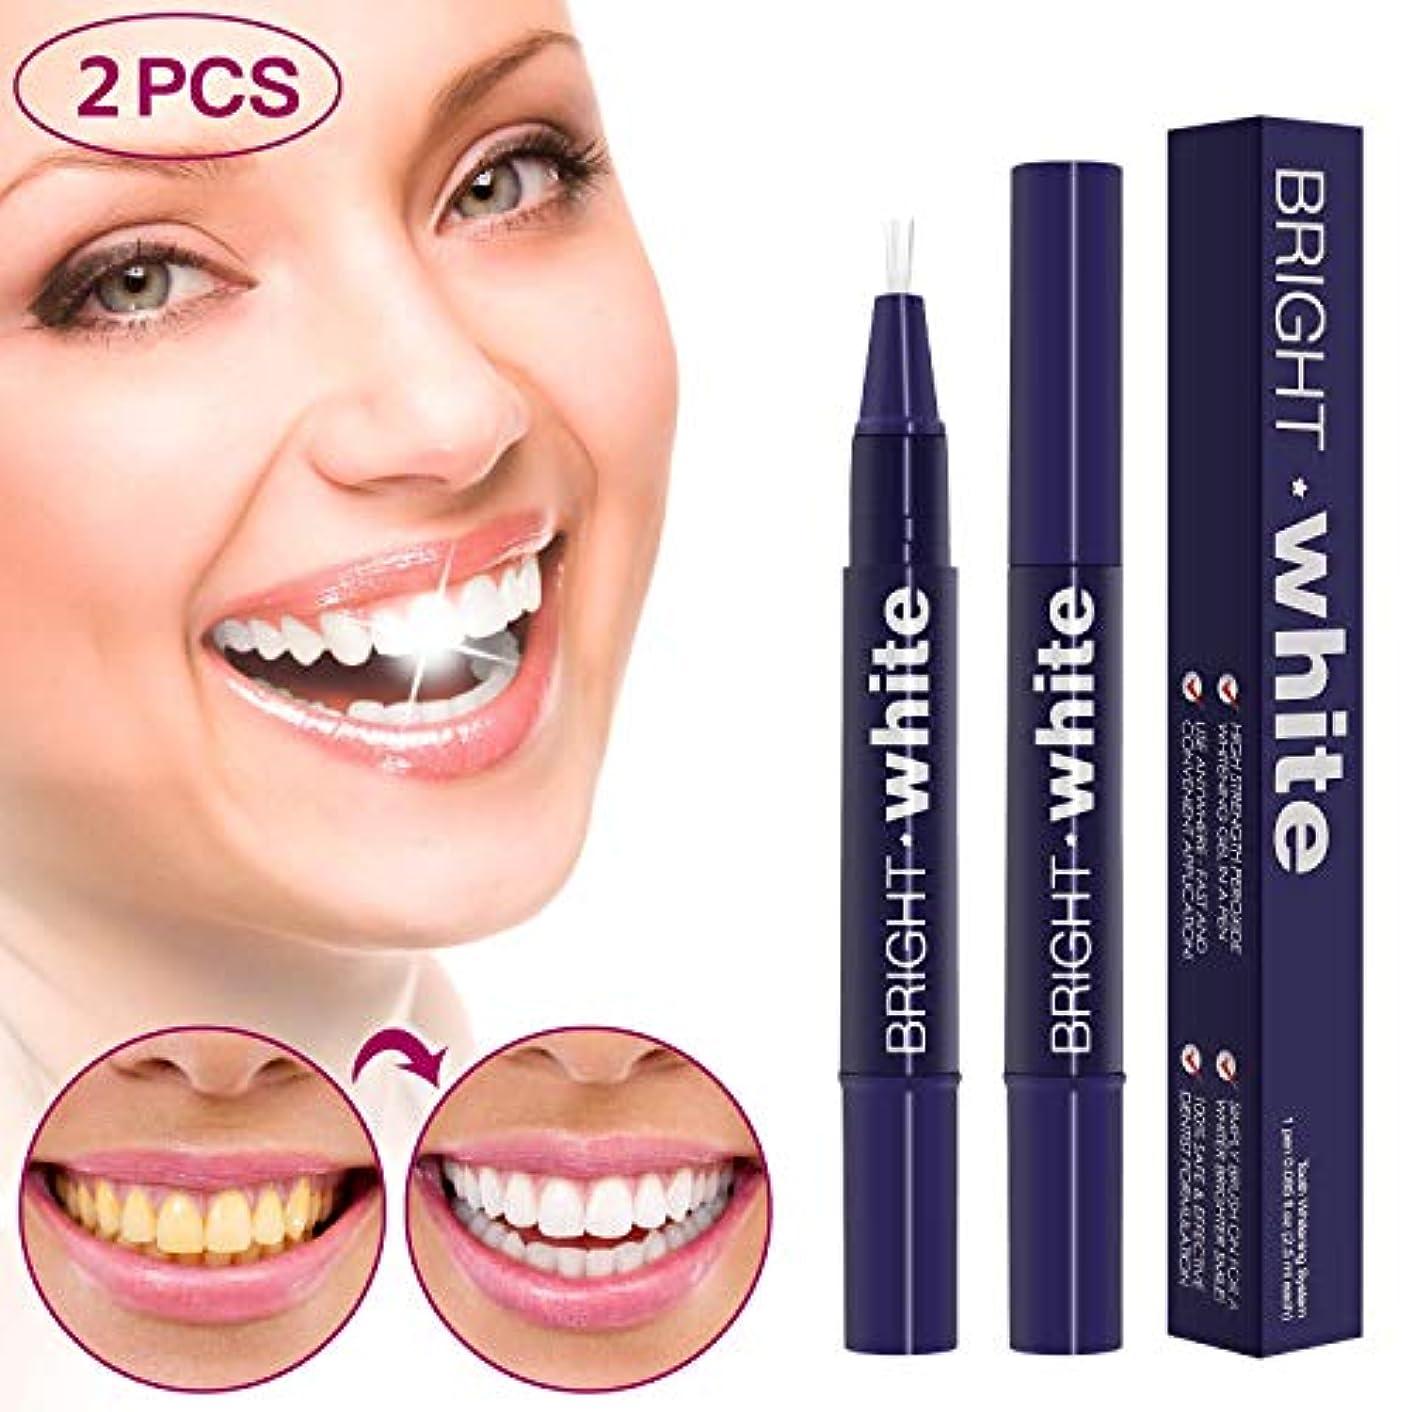 Odette 2019 歯のホワイトニング 美白歯ゲル 歯 ホワイトニングペン ホワイトニングペン 歯ブラシ 輝く笑顔 口臭防止 歯周病防止 2本 (2pcs)